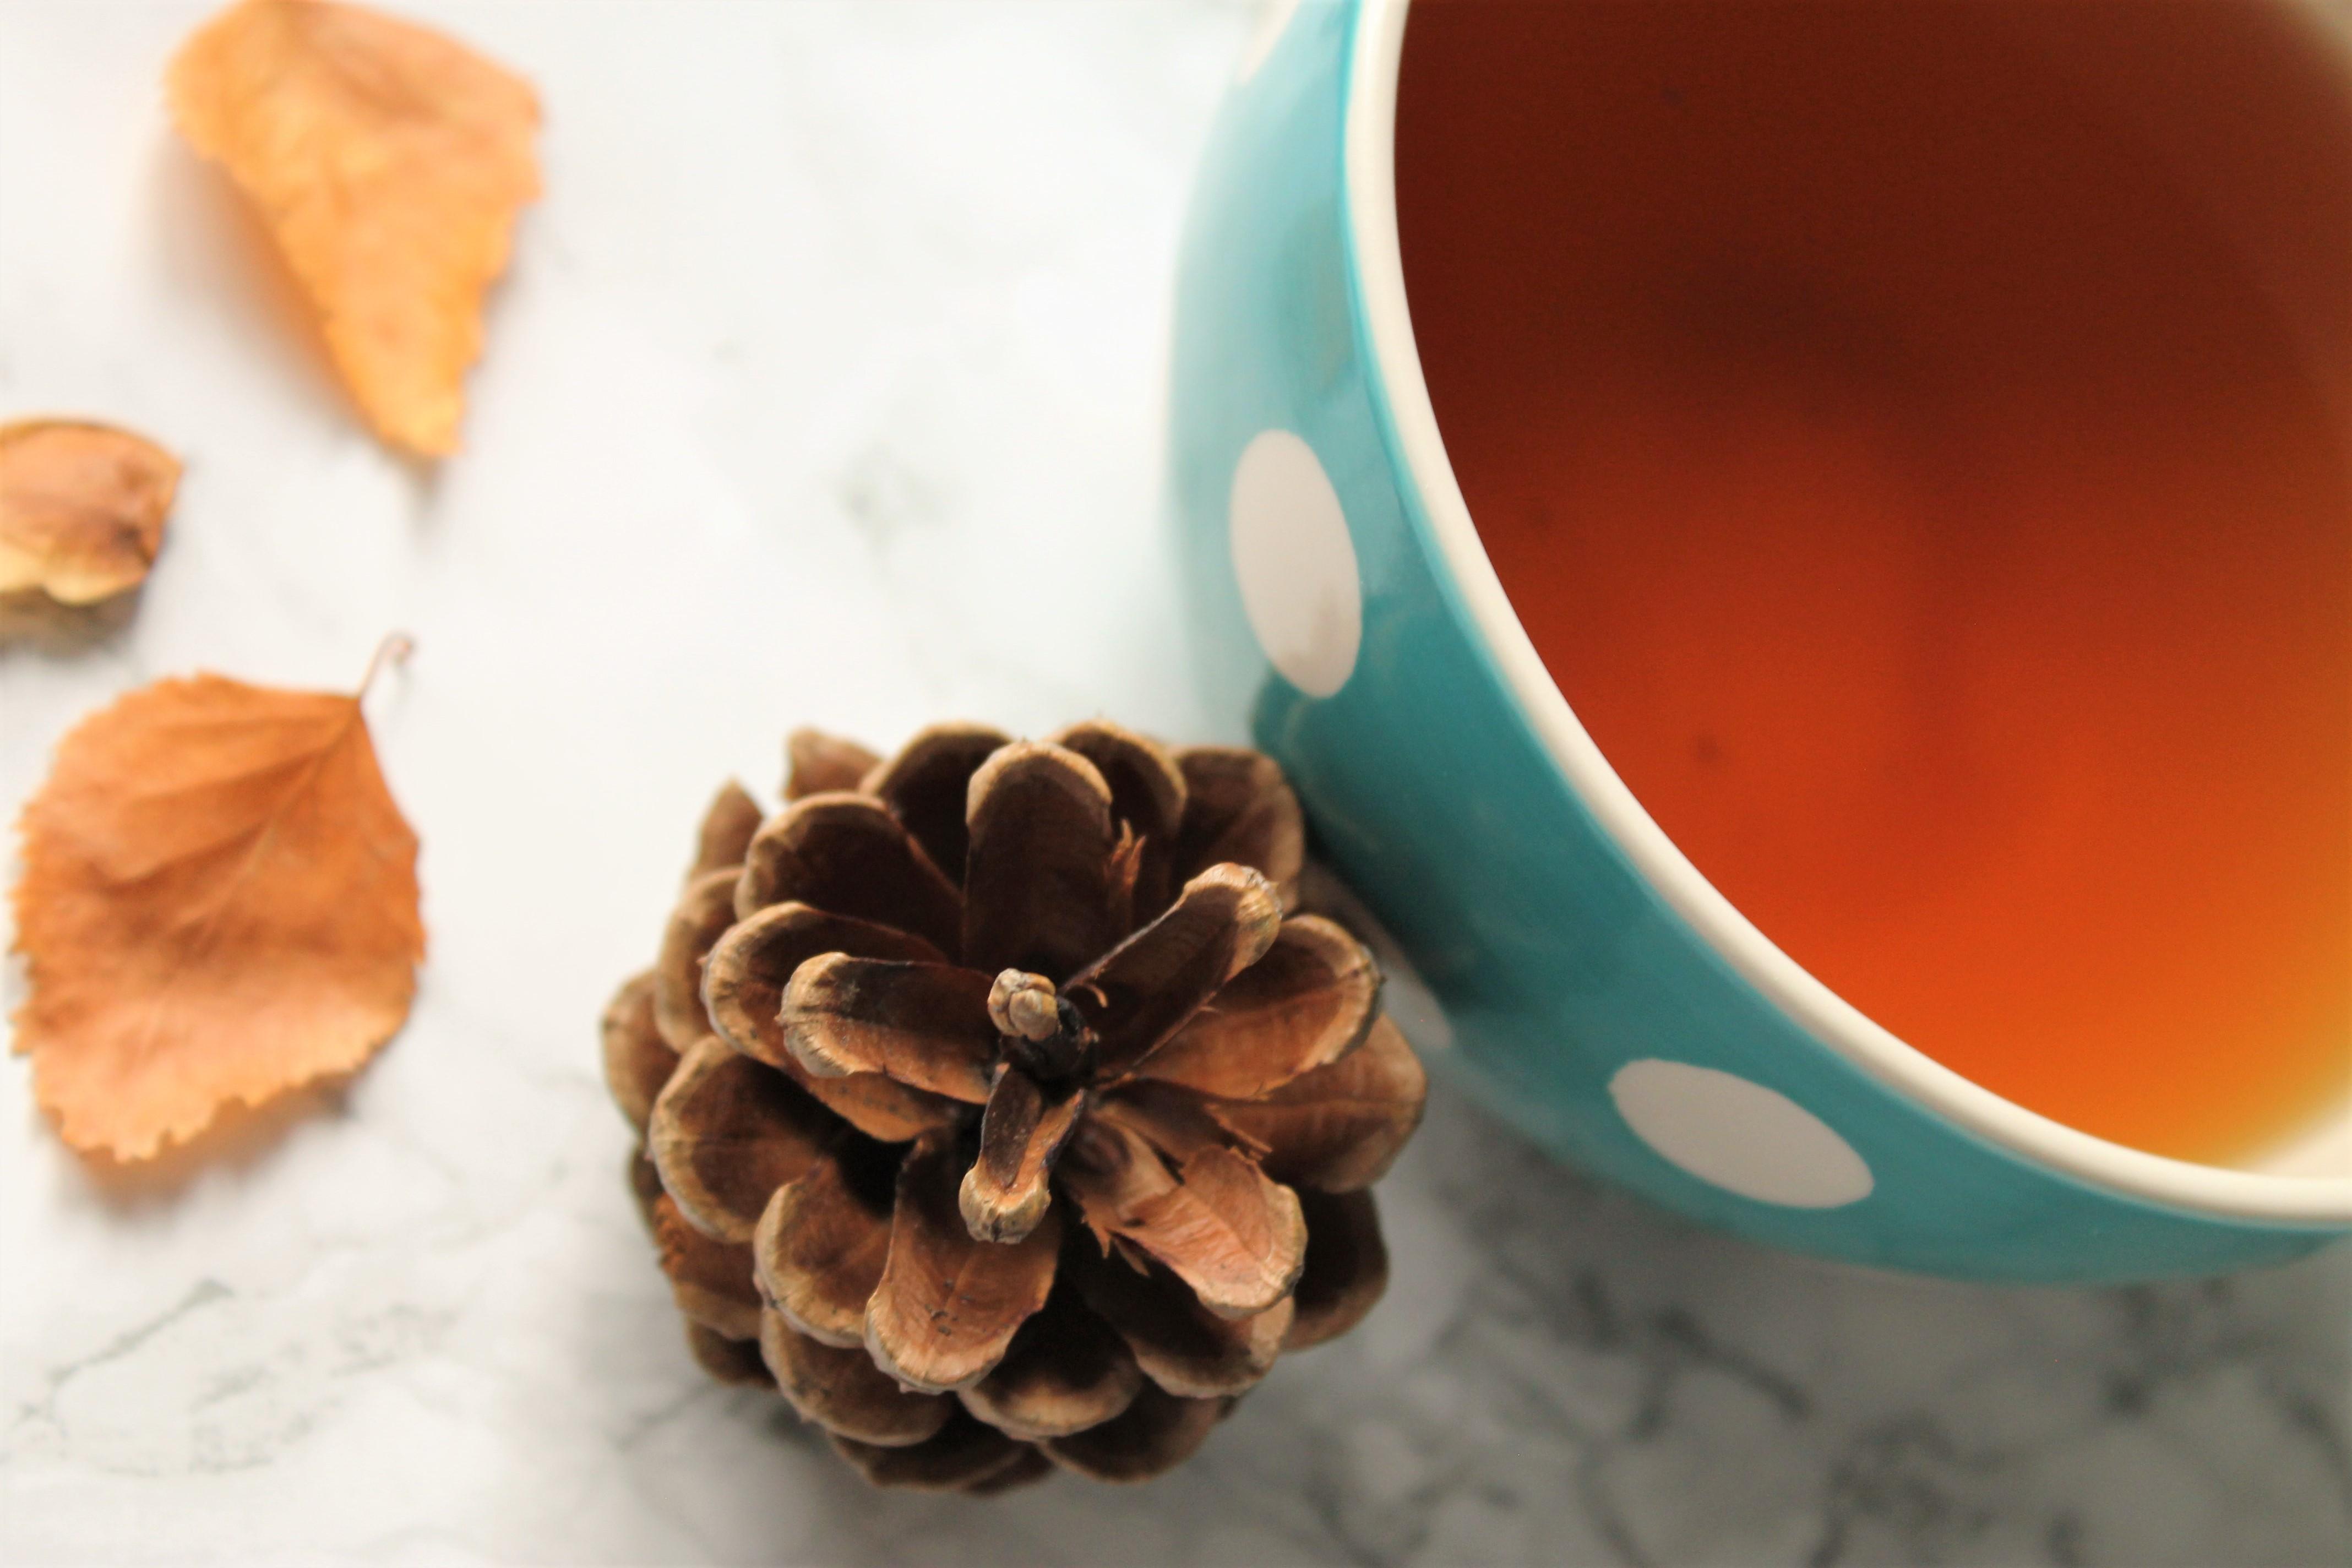 pinecone polkadot teacup black ginger tea